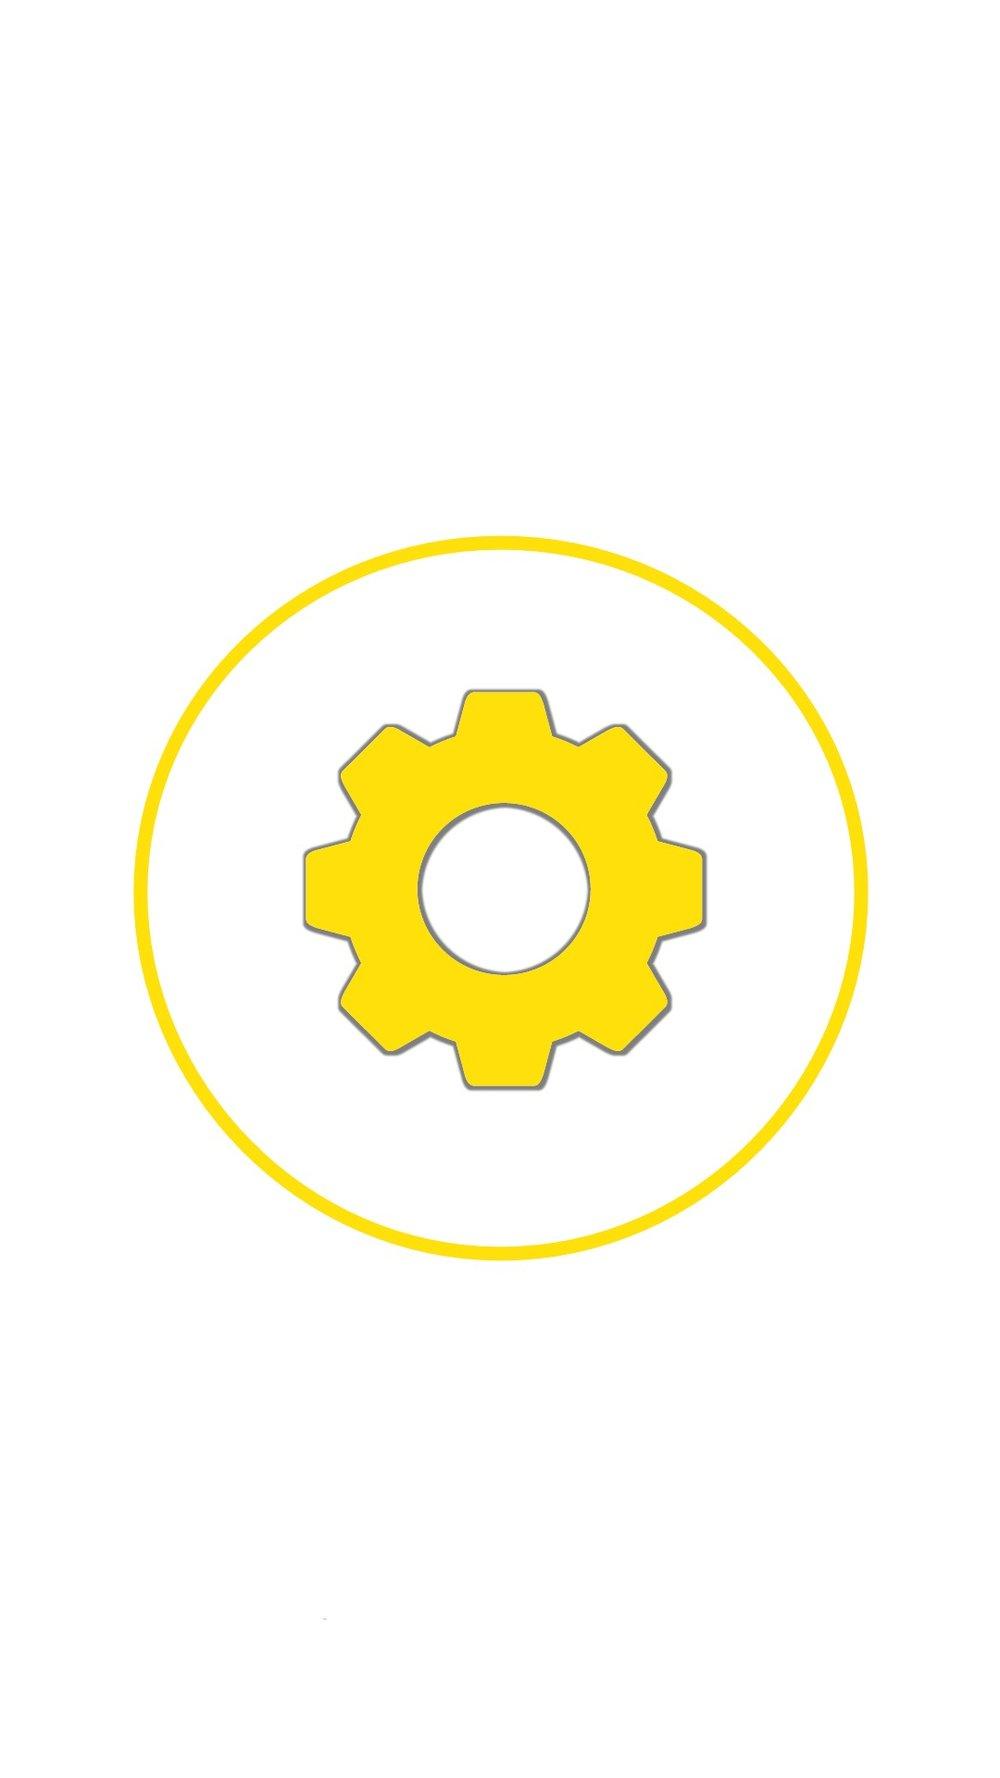 Instagram-cover-tool-yellow-lotnotes.com.jpg